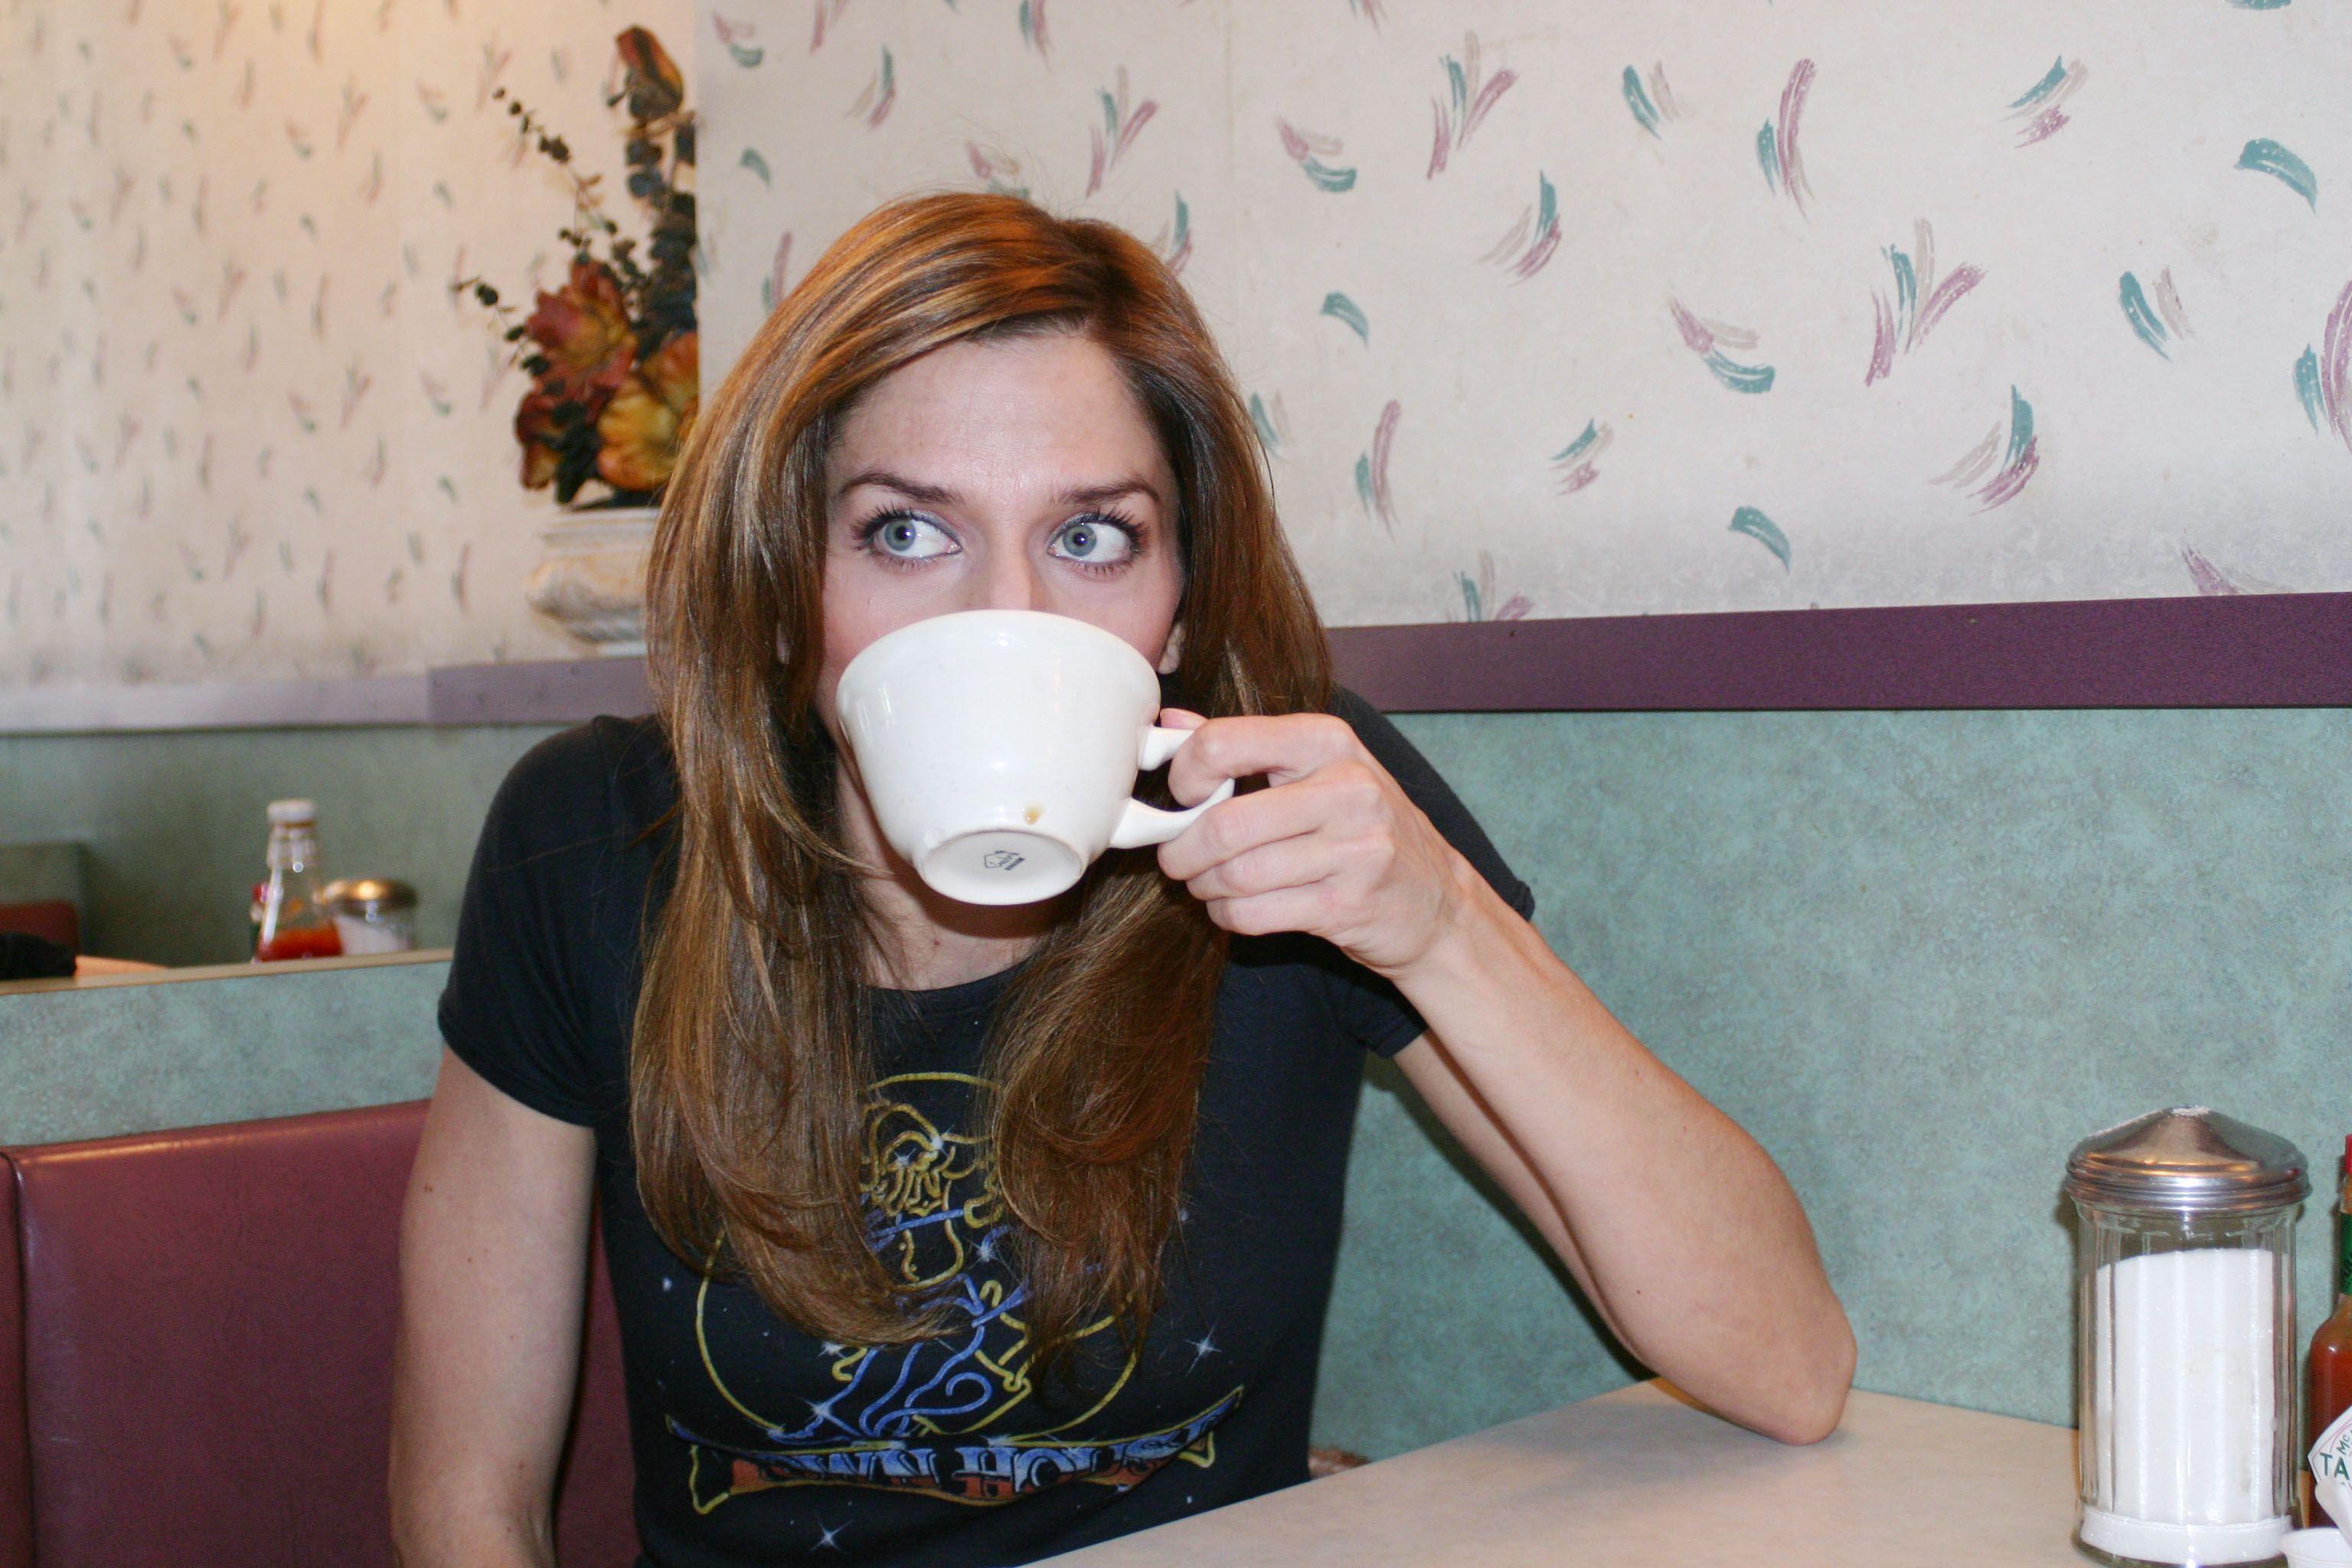 Chelsea Pinterest: Chelsea Peretti :: Comedian